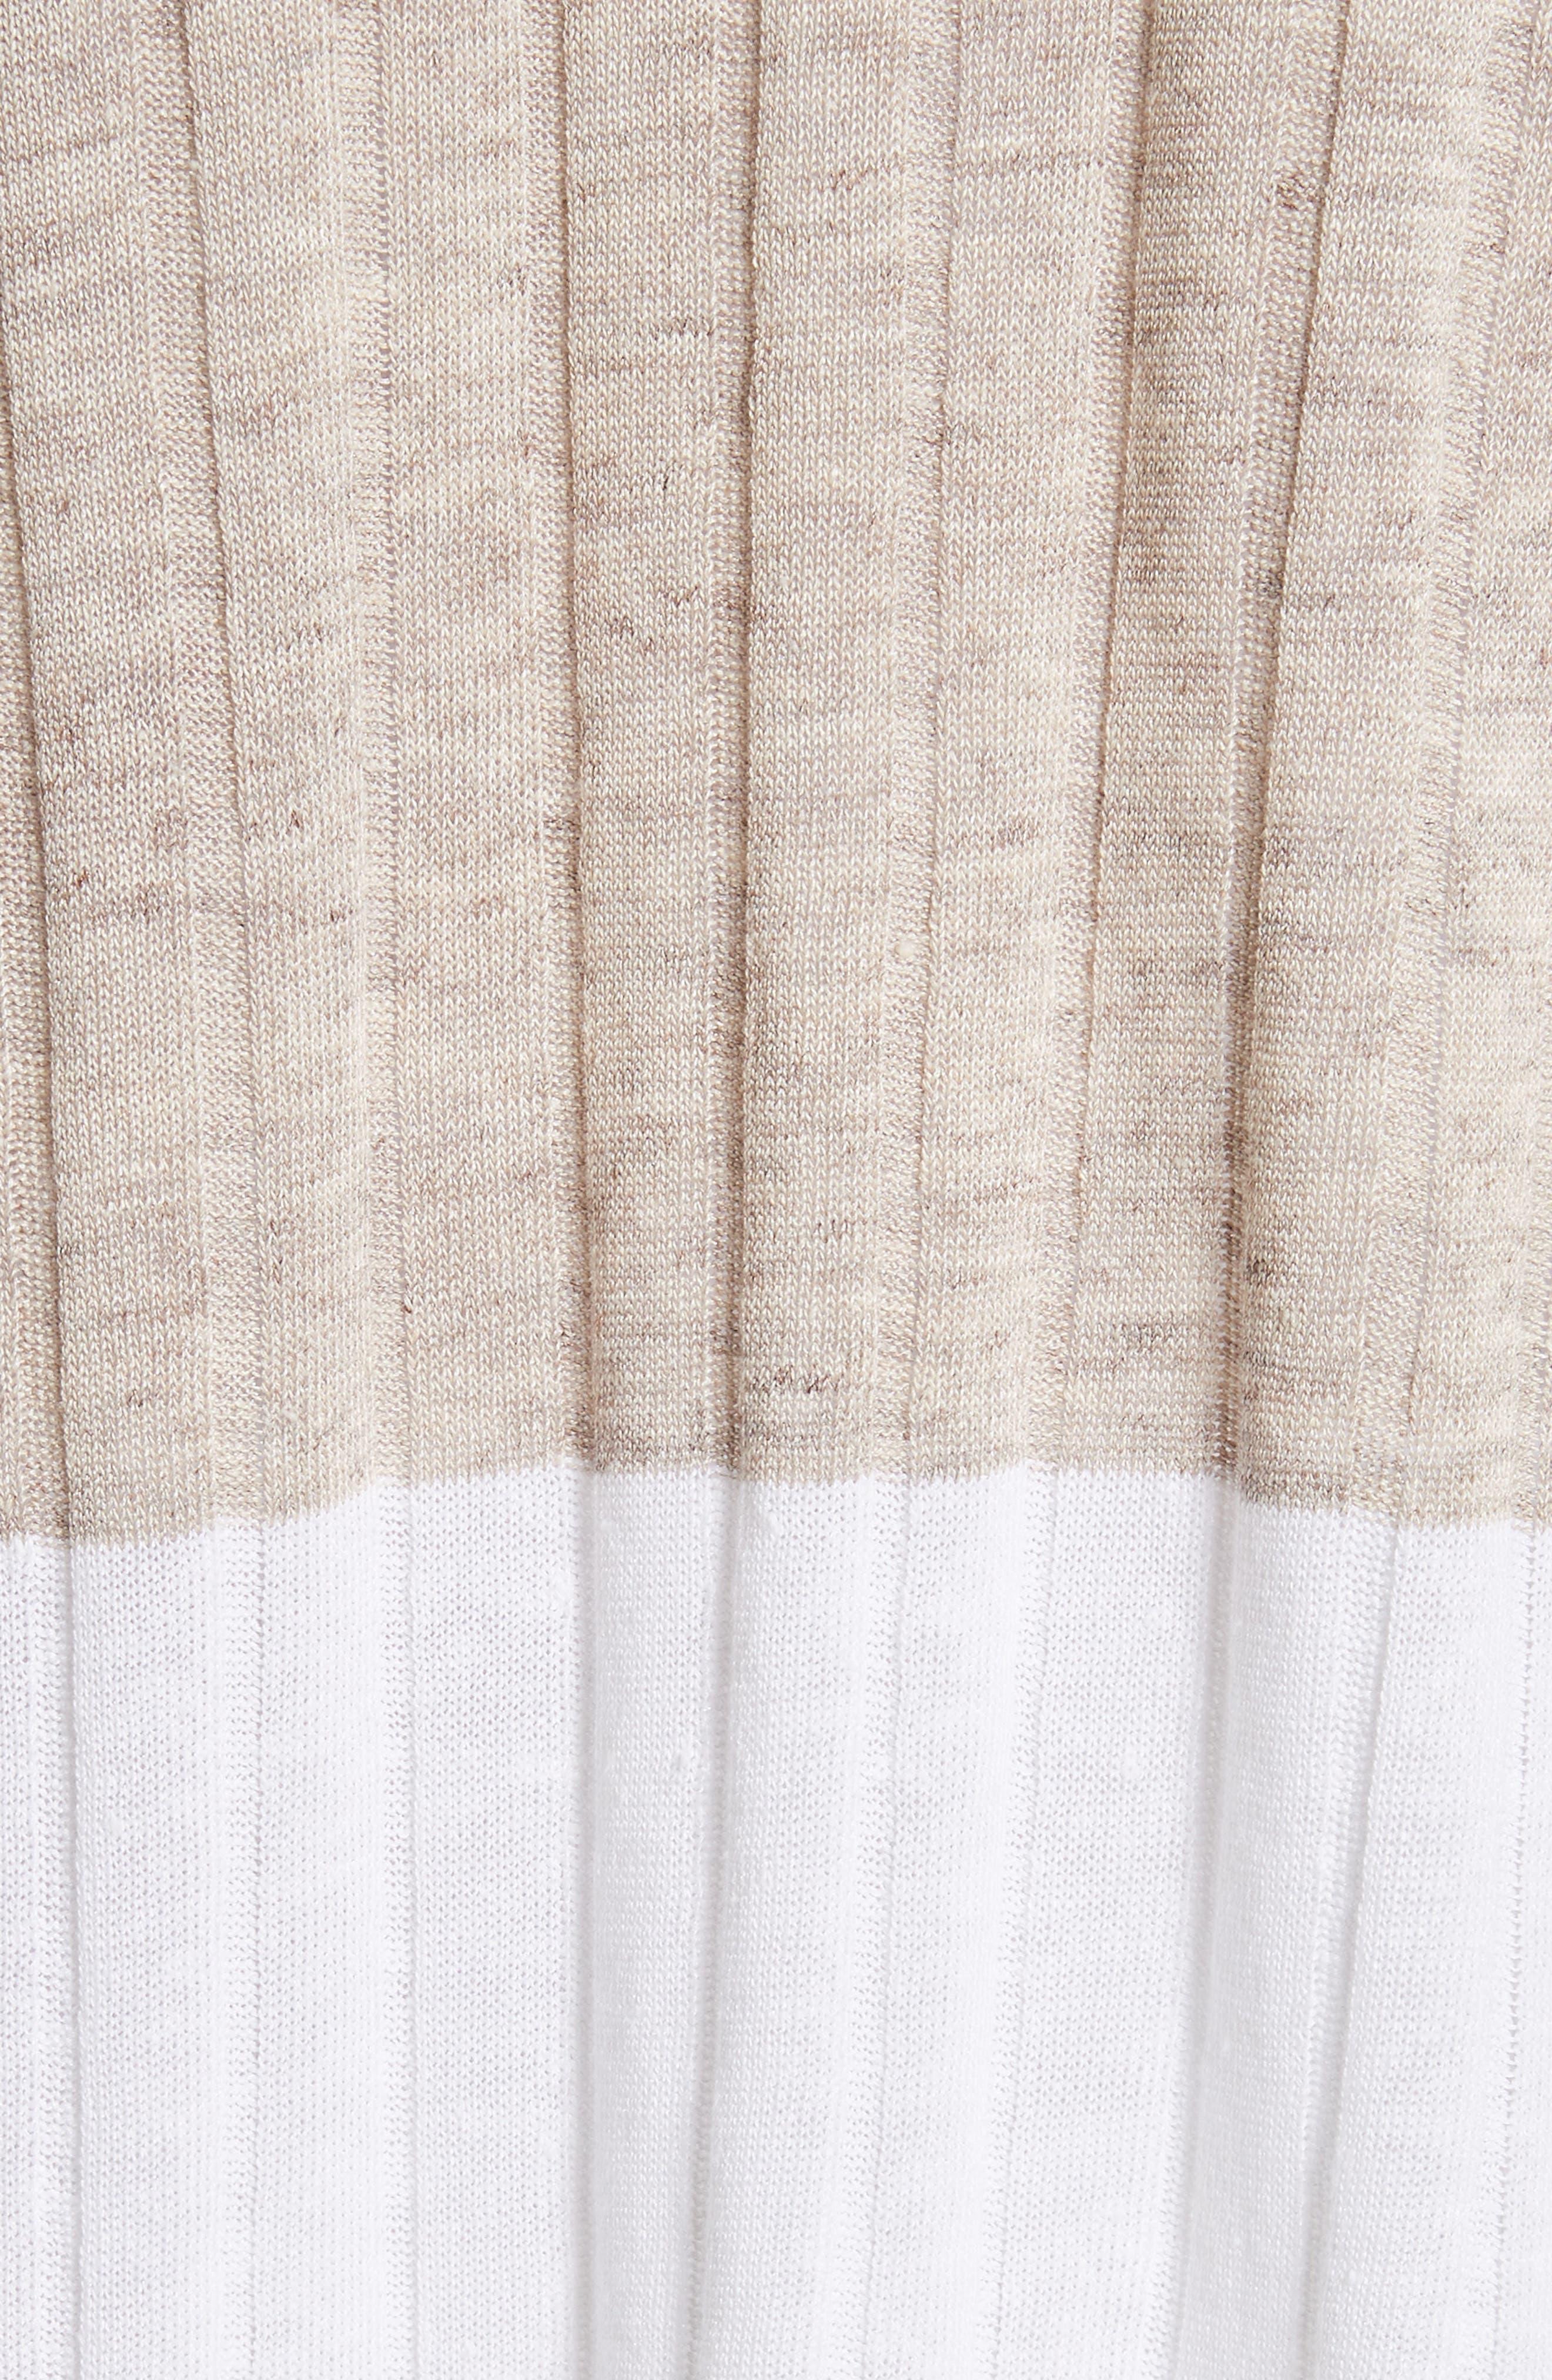 Two-Tone Rib Knit Cardigan,                             Alternate thumbnail 6, color,                             Ecru/ Ivory